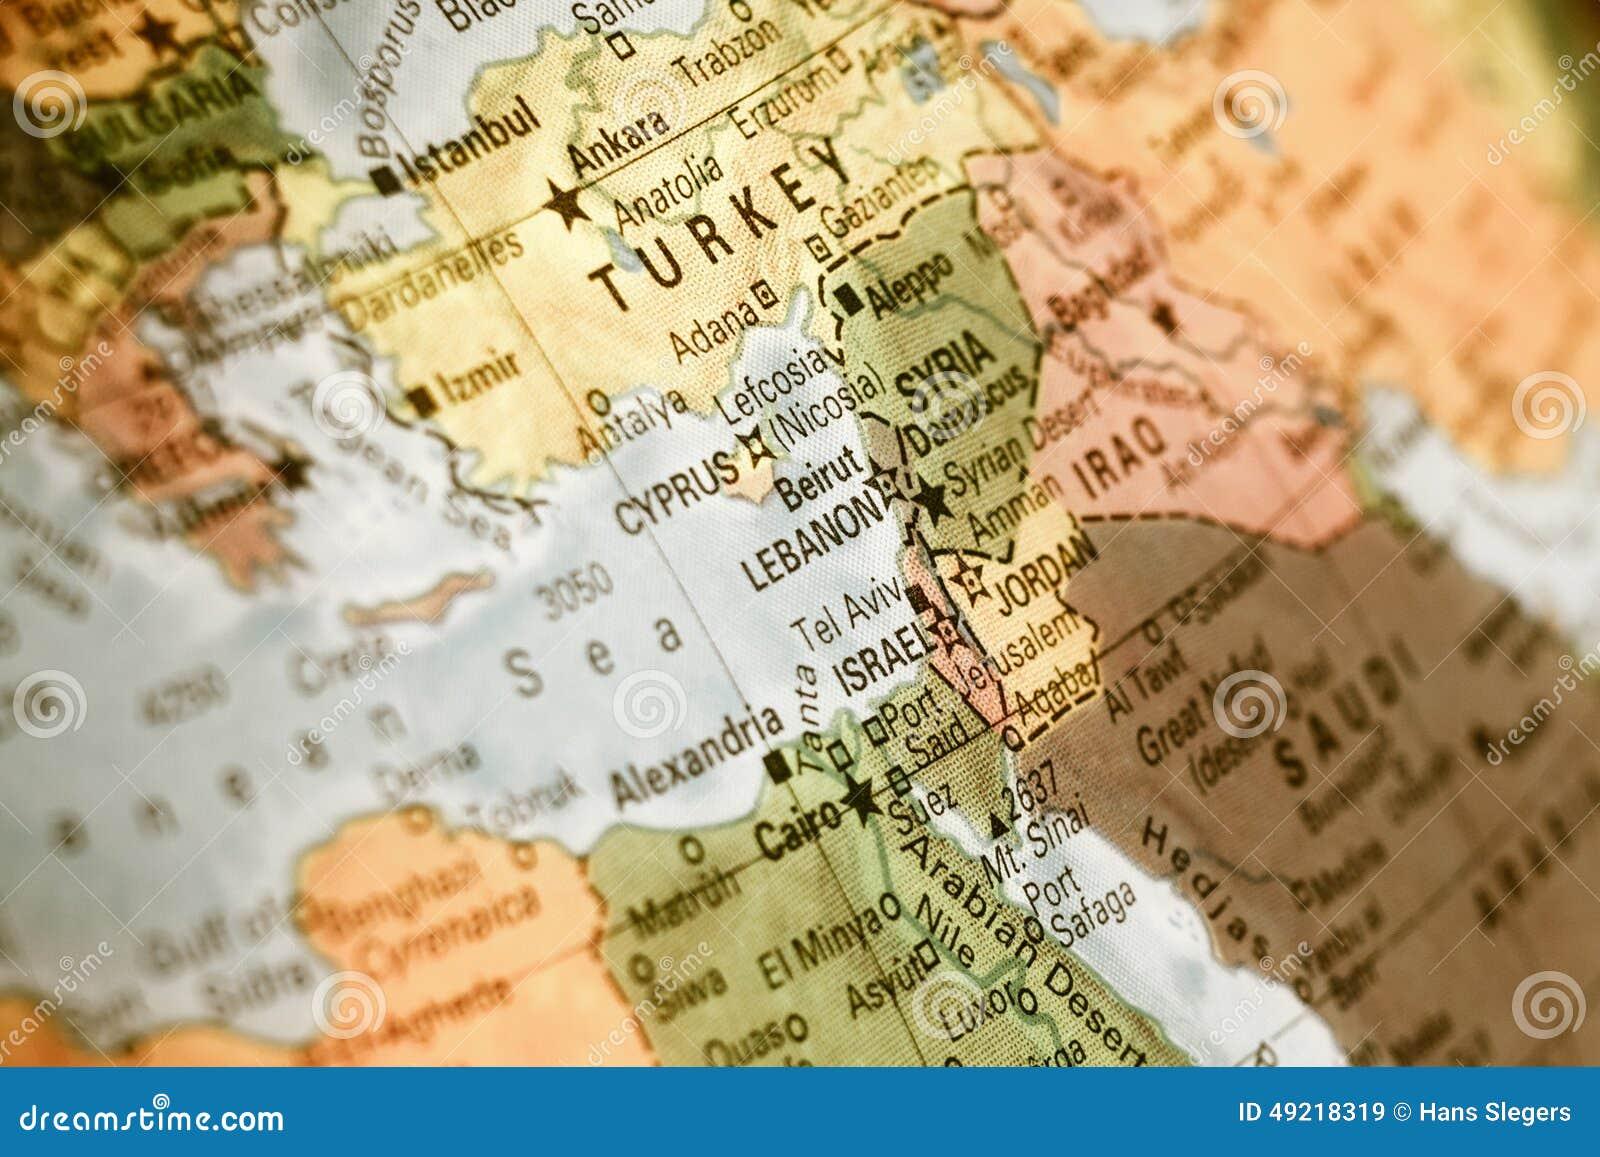 Cartina Libano E Israele.Mappa Di Israele Turchia Giordania Libano Immagine Stock Immagine Di Closeup Selettivo 49218319